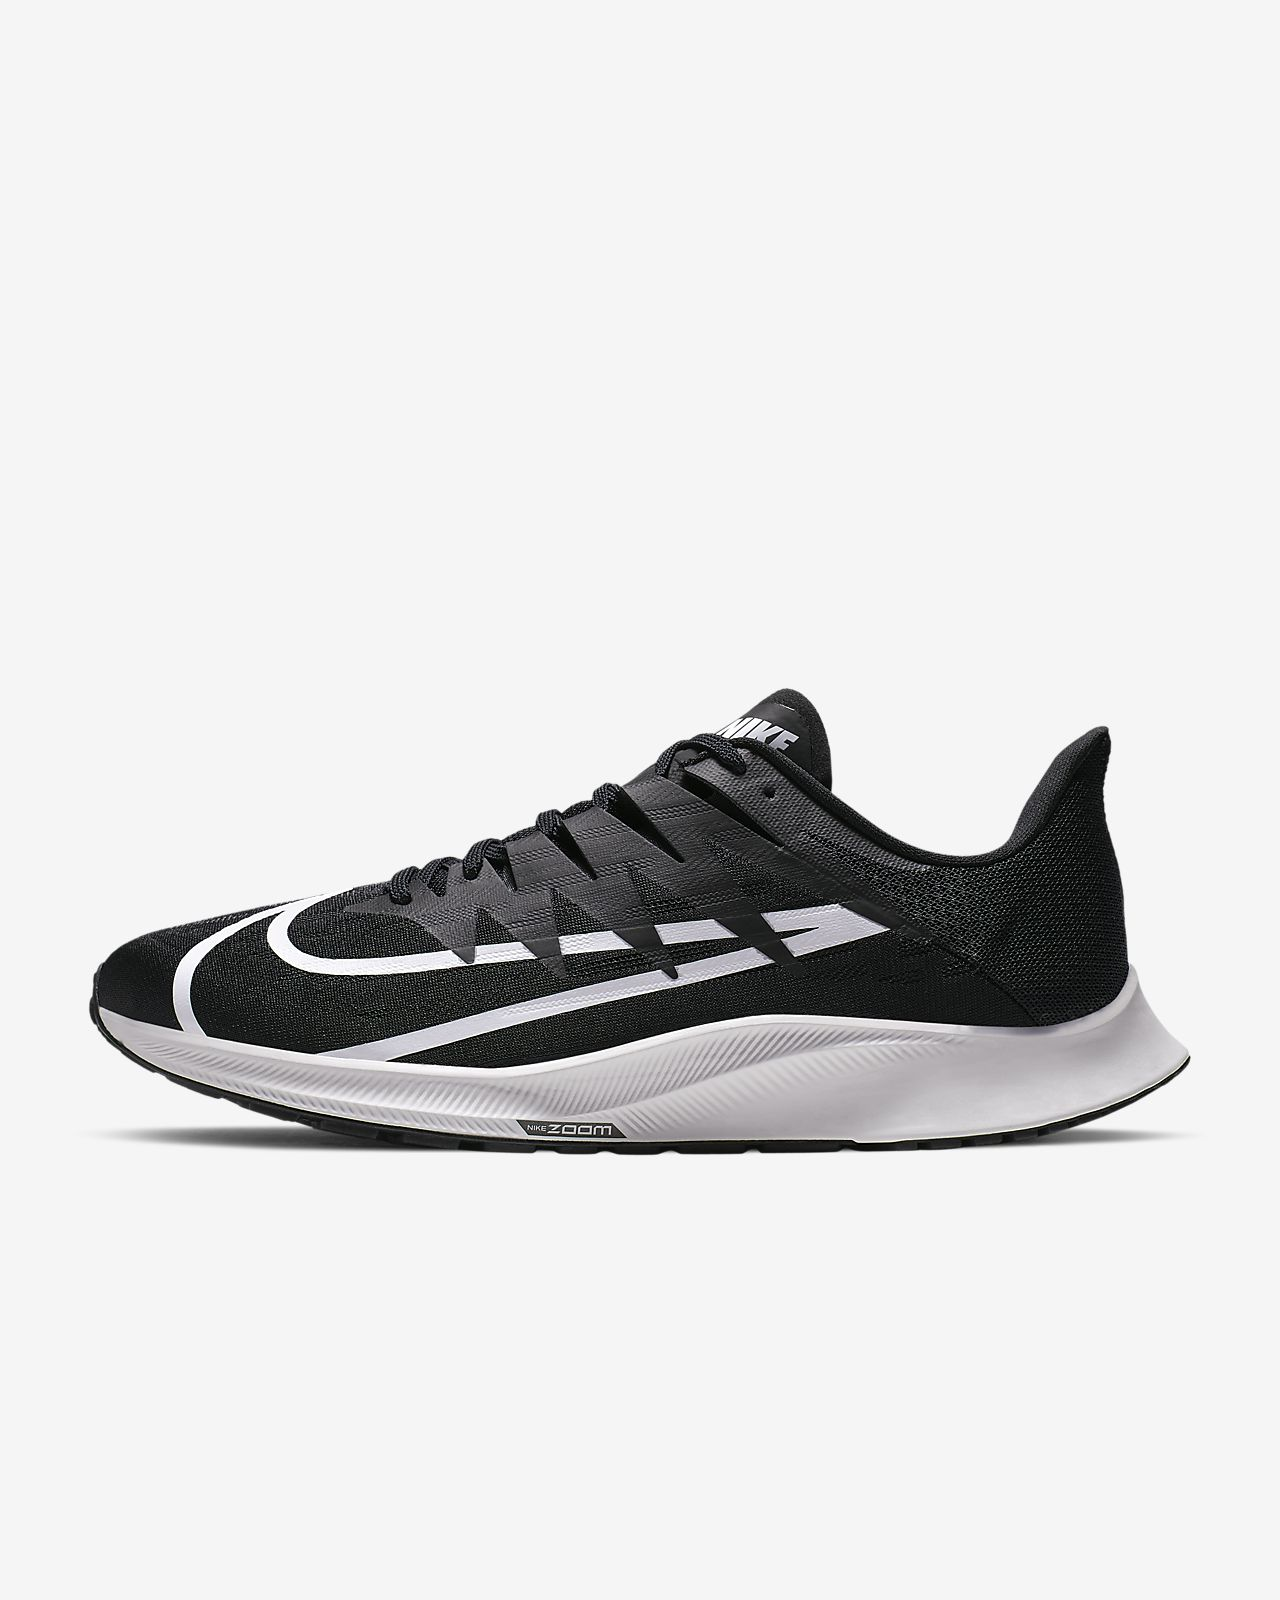 Nike Zoom Rival Fly (W) 男子跑步鞋(宽版)